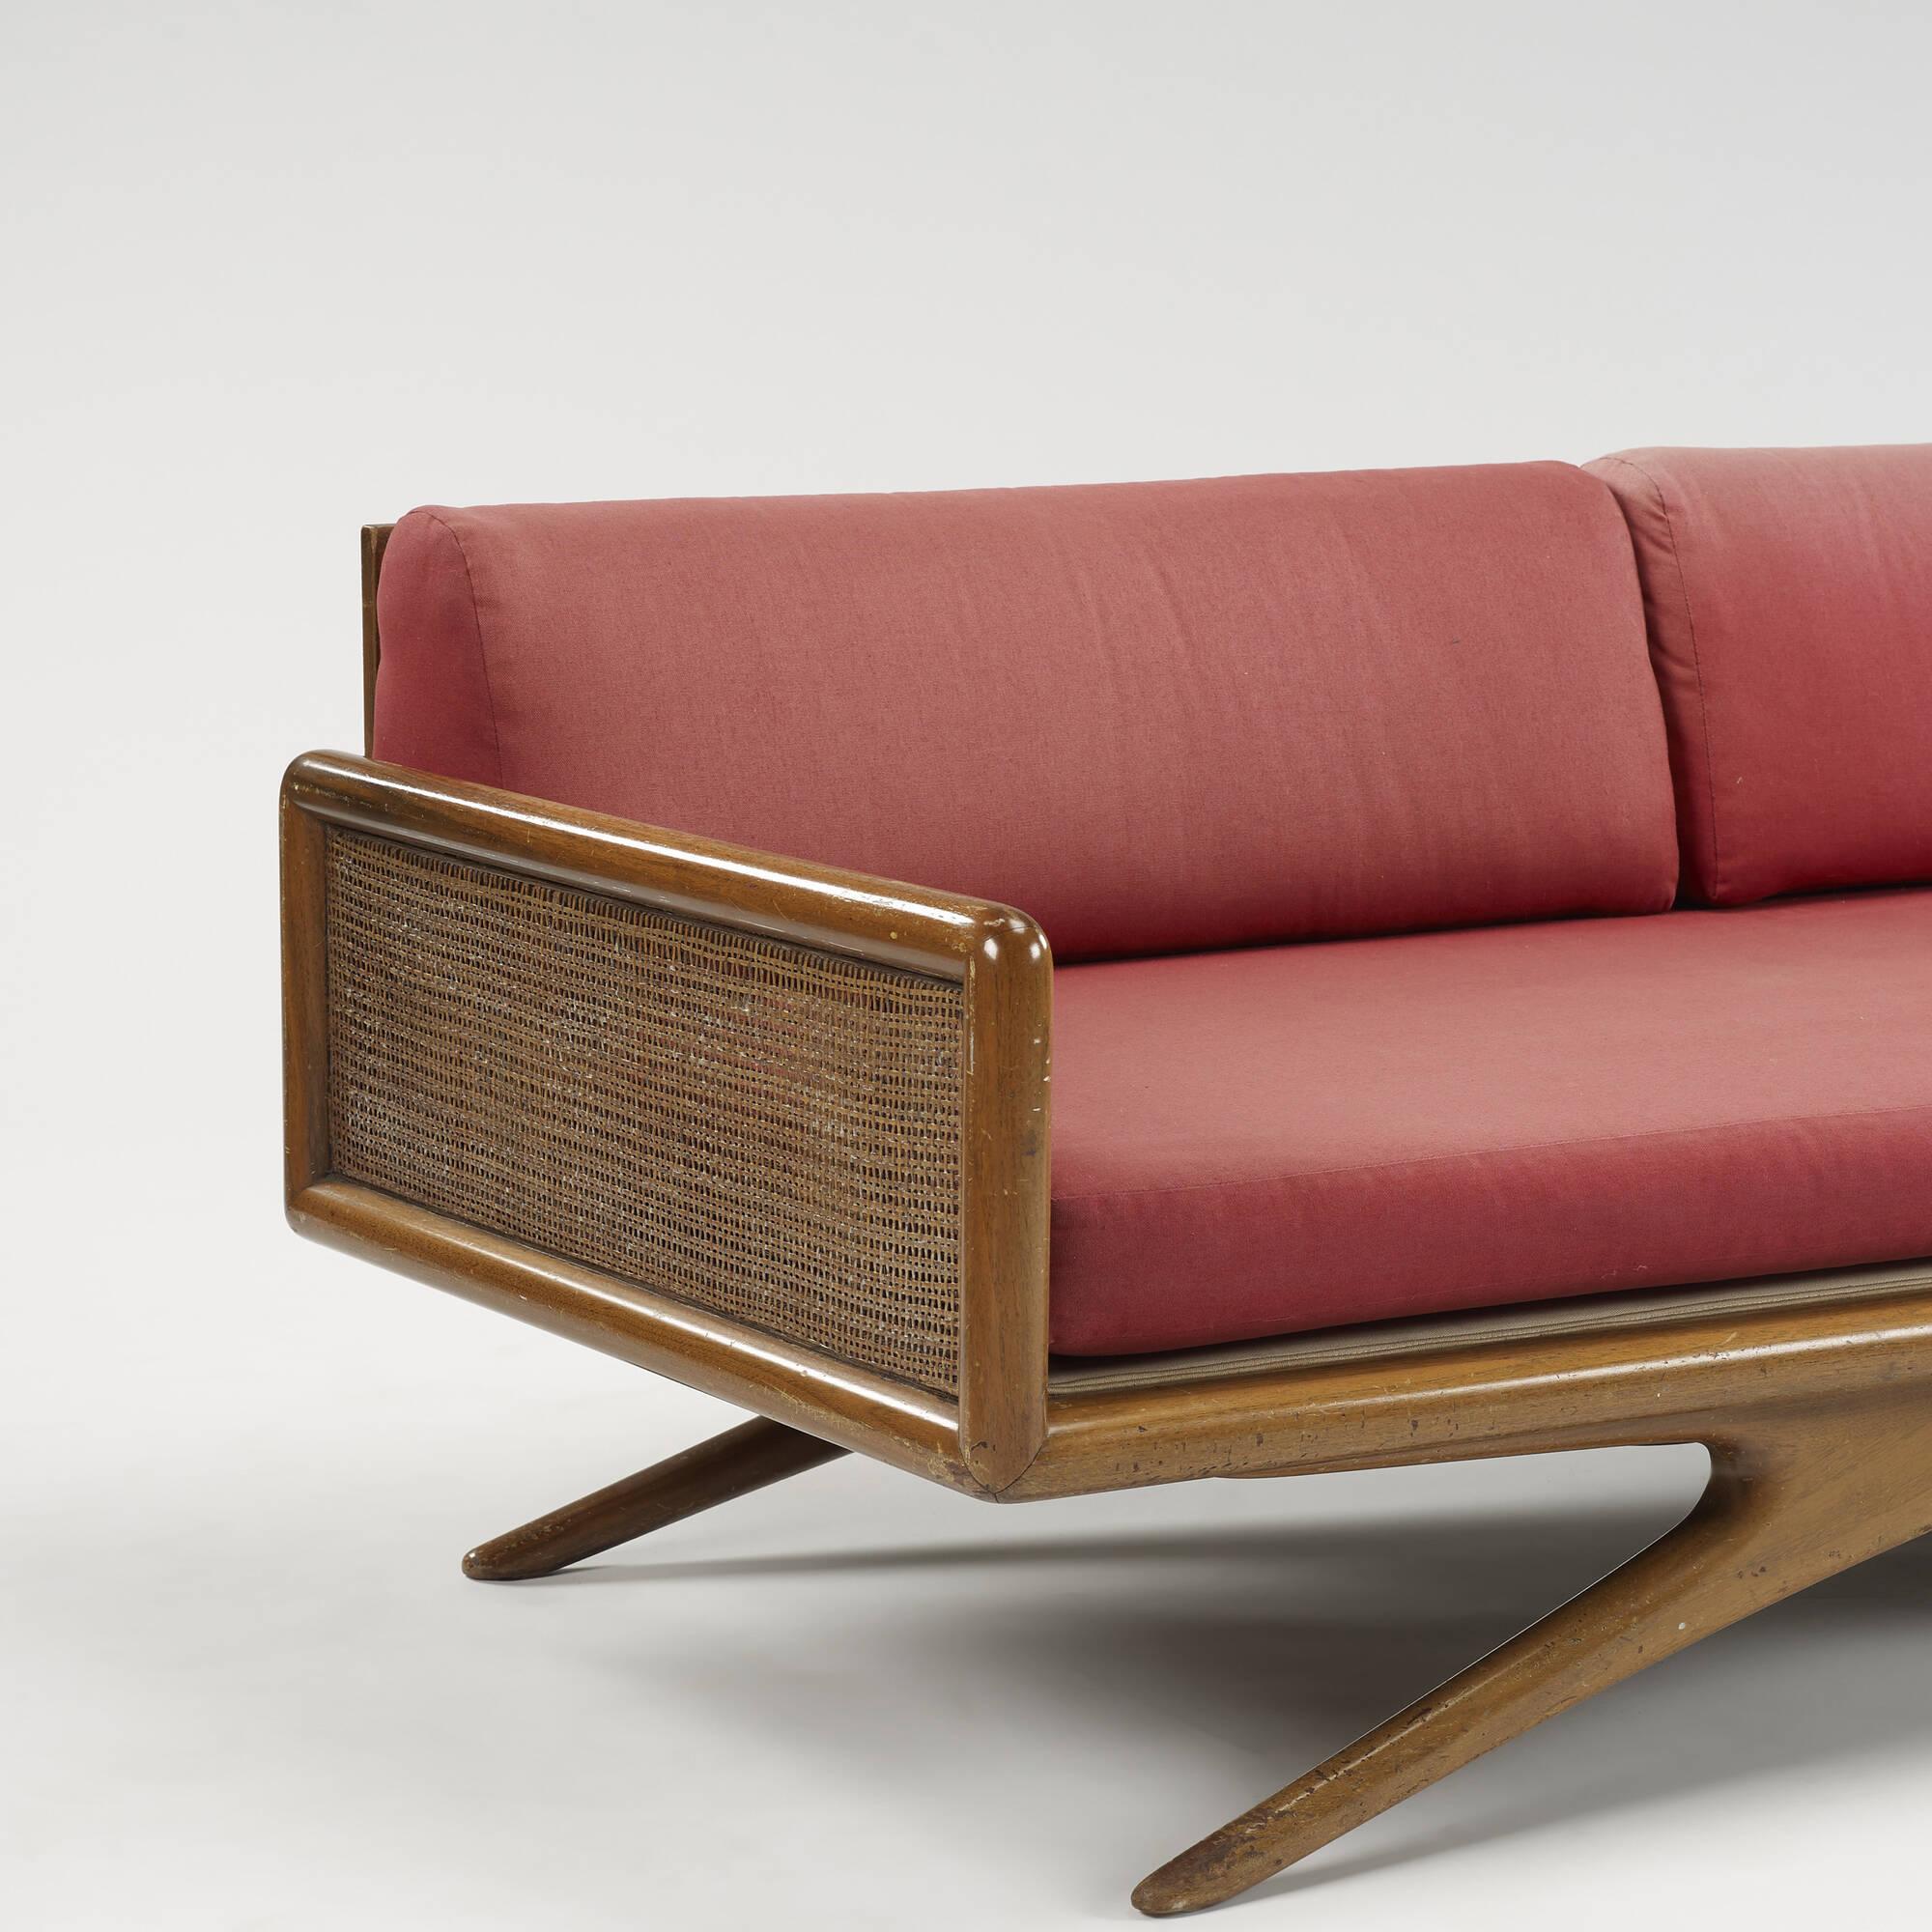 297 Vladimir Kagan sofa Design 11 June 2015 Auctions